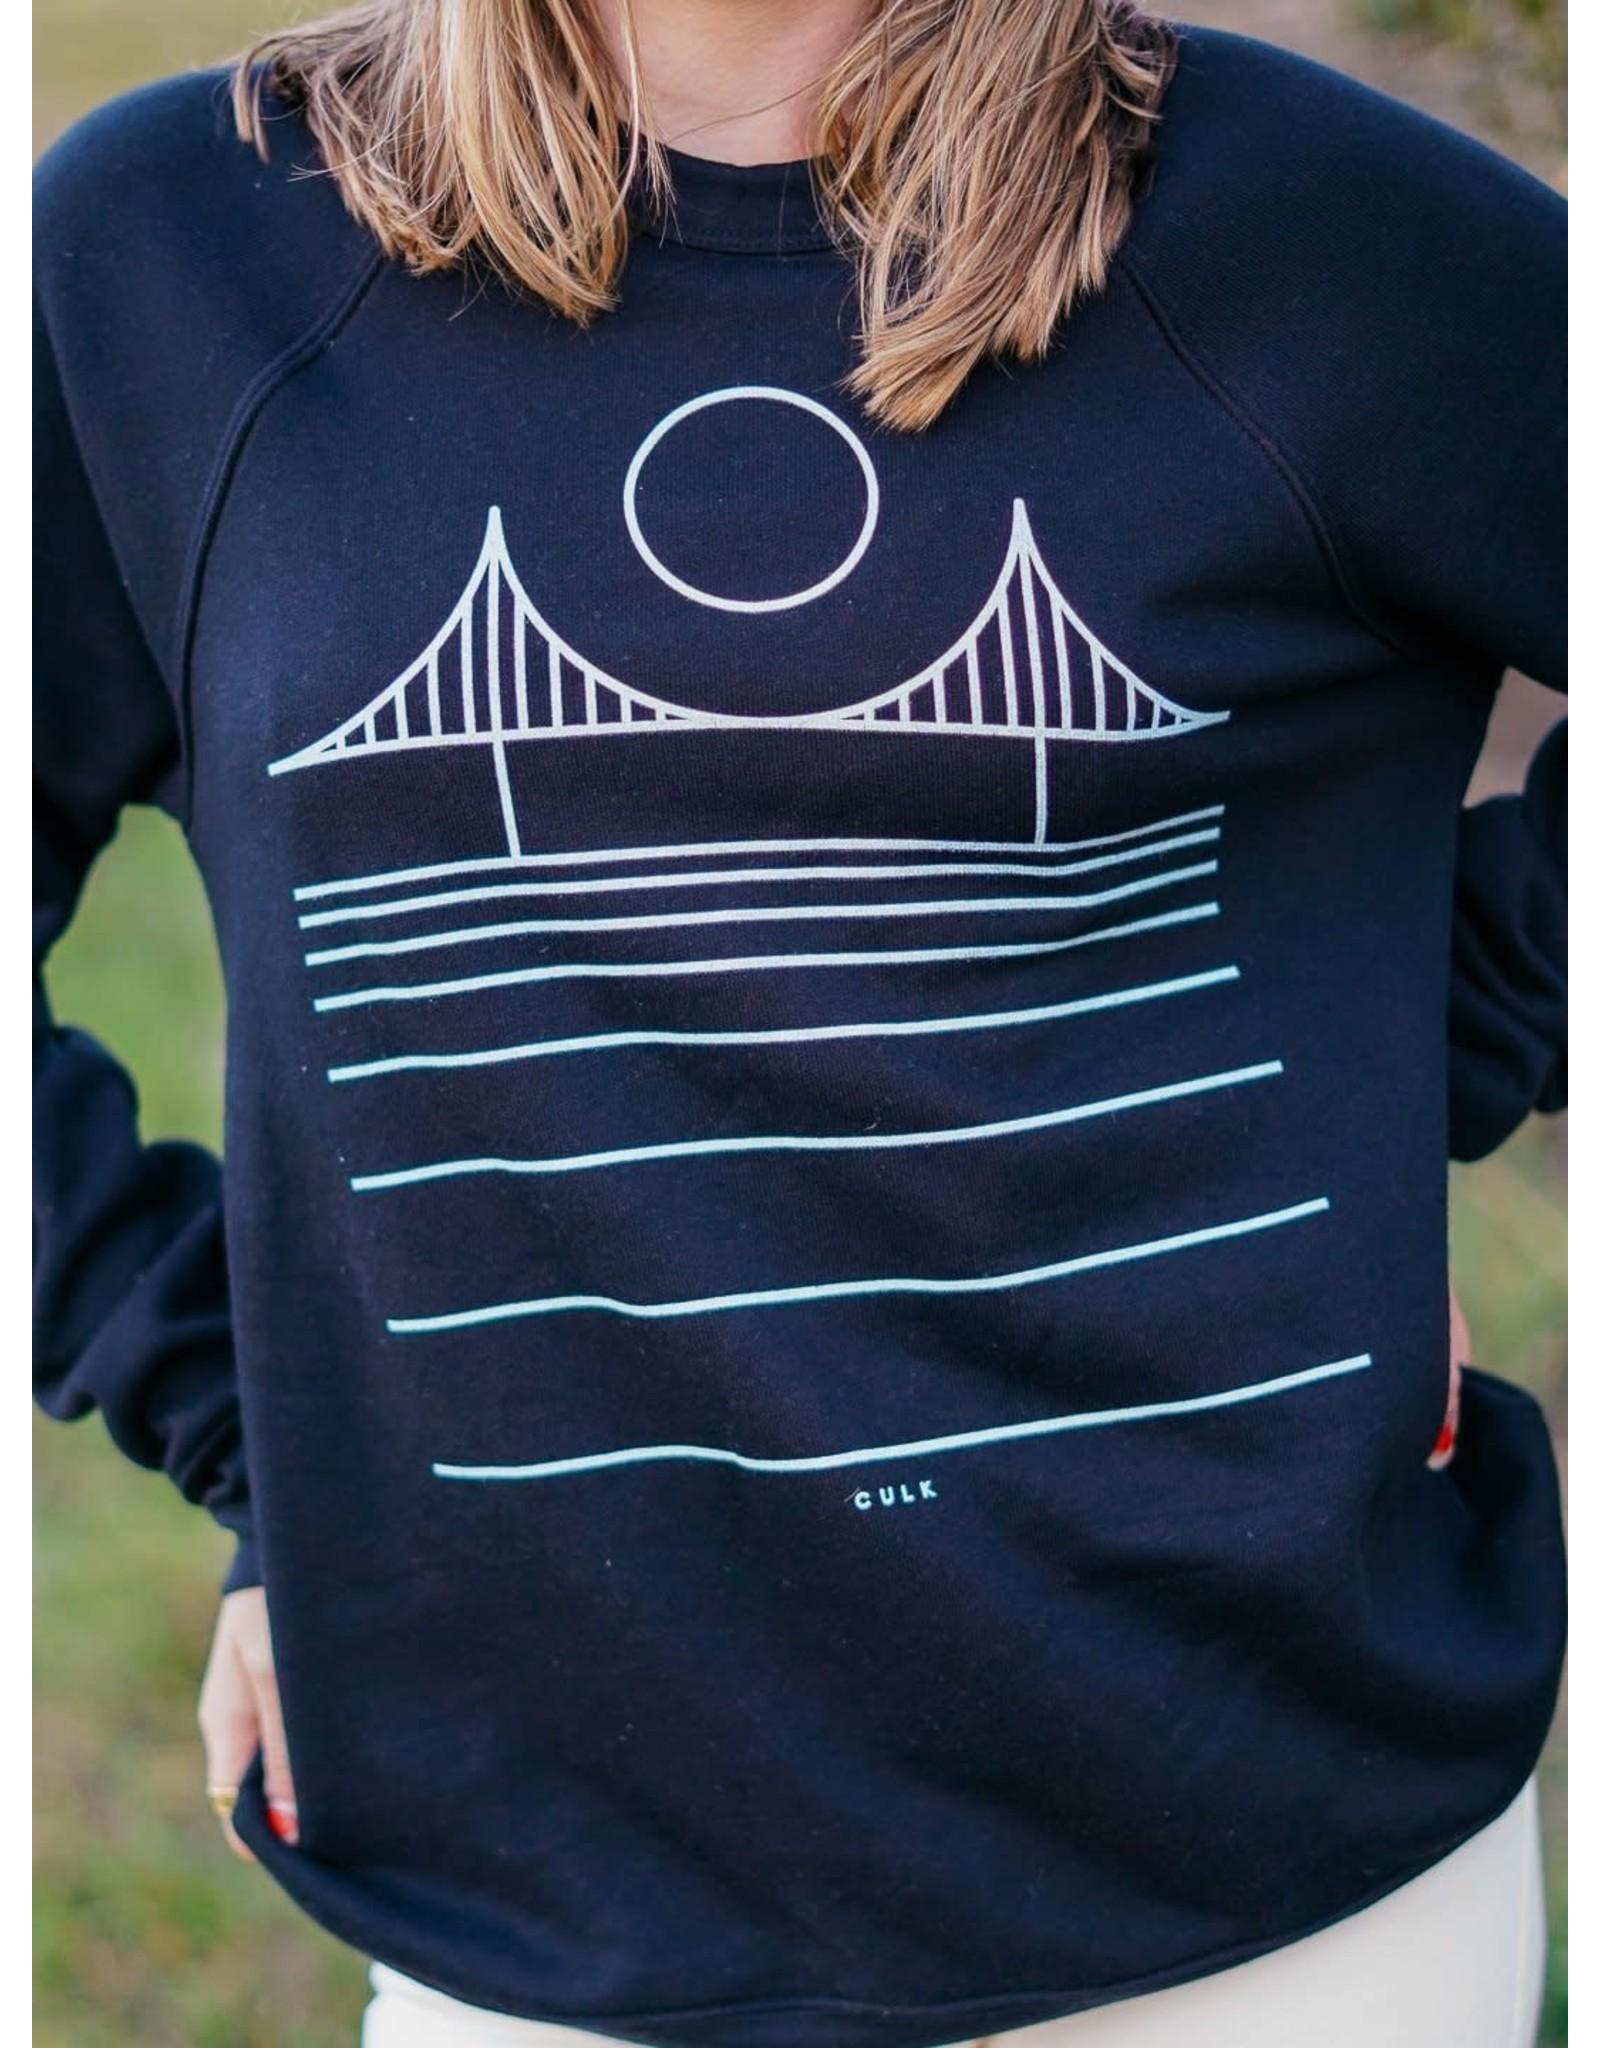 Culk Minimal Bridge Crewneck Sweatshirt - Black